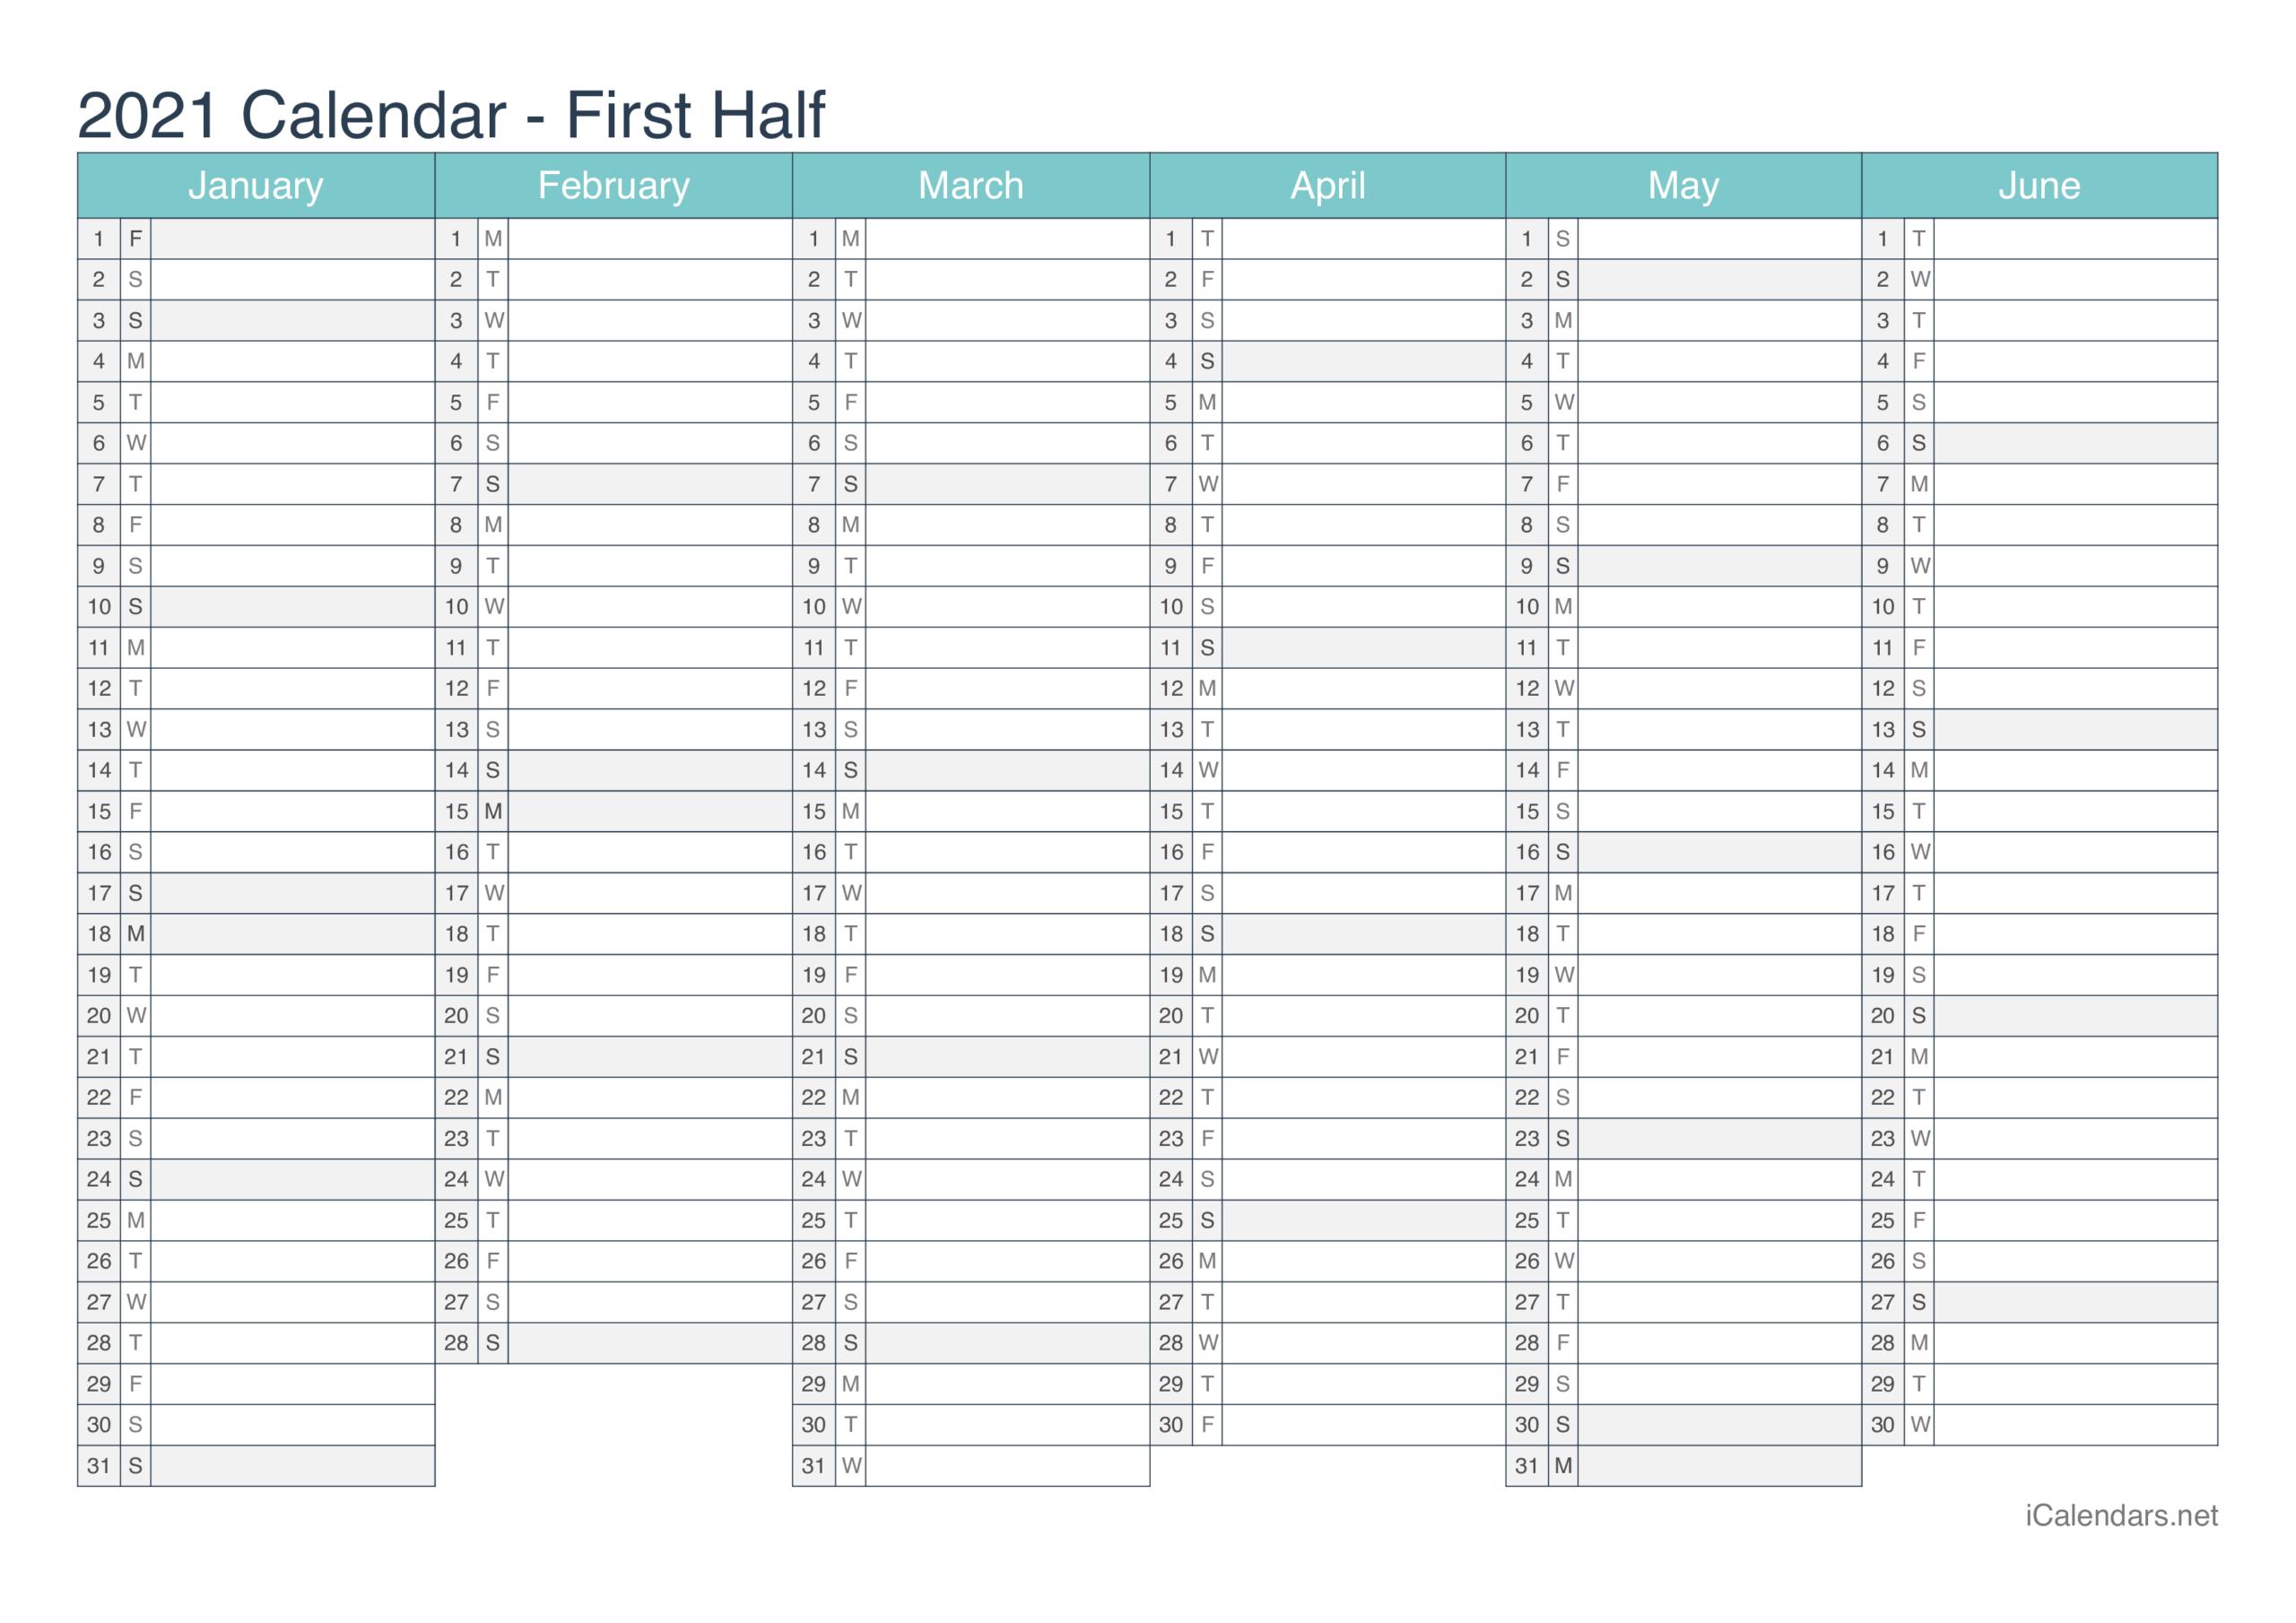 2021 Printable Calendar - Pdf Or Excel - Icalendars